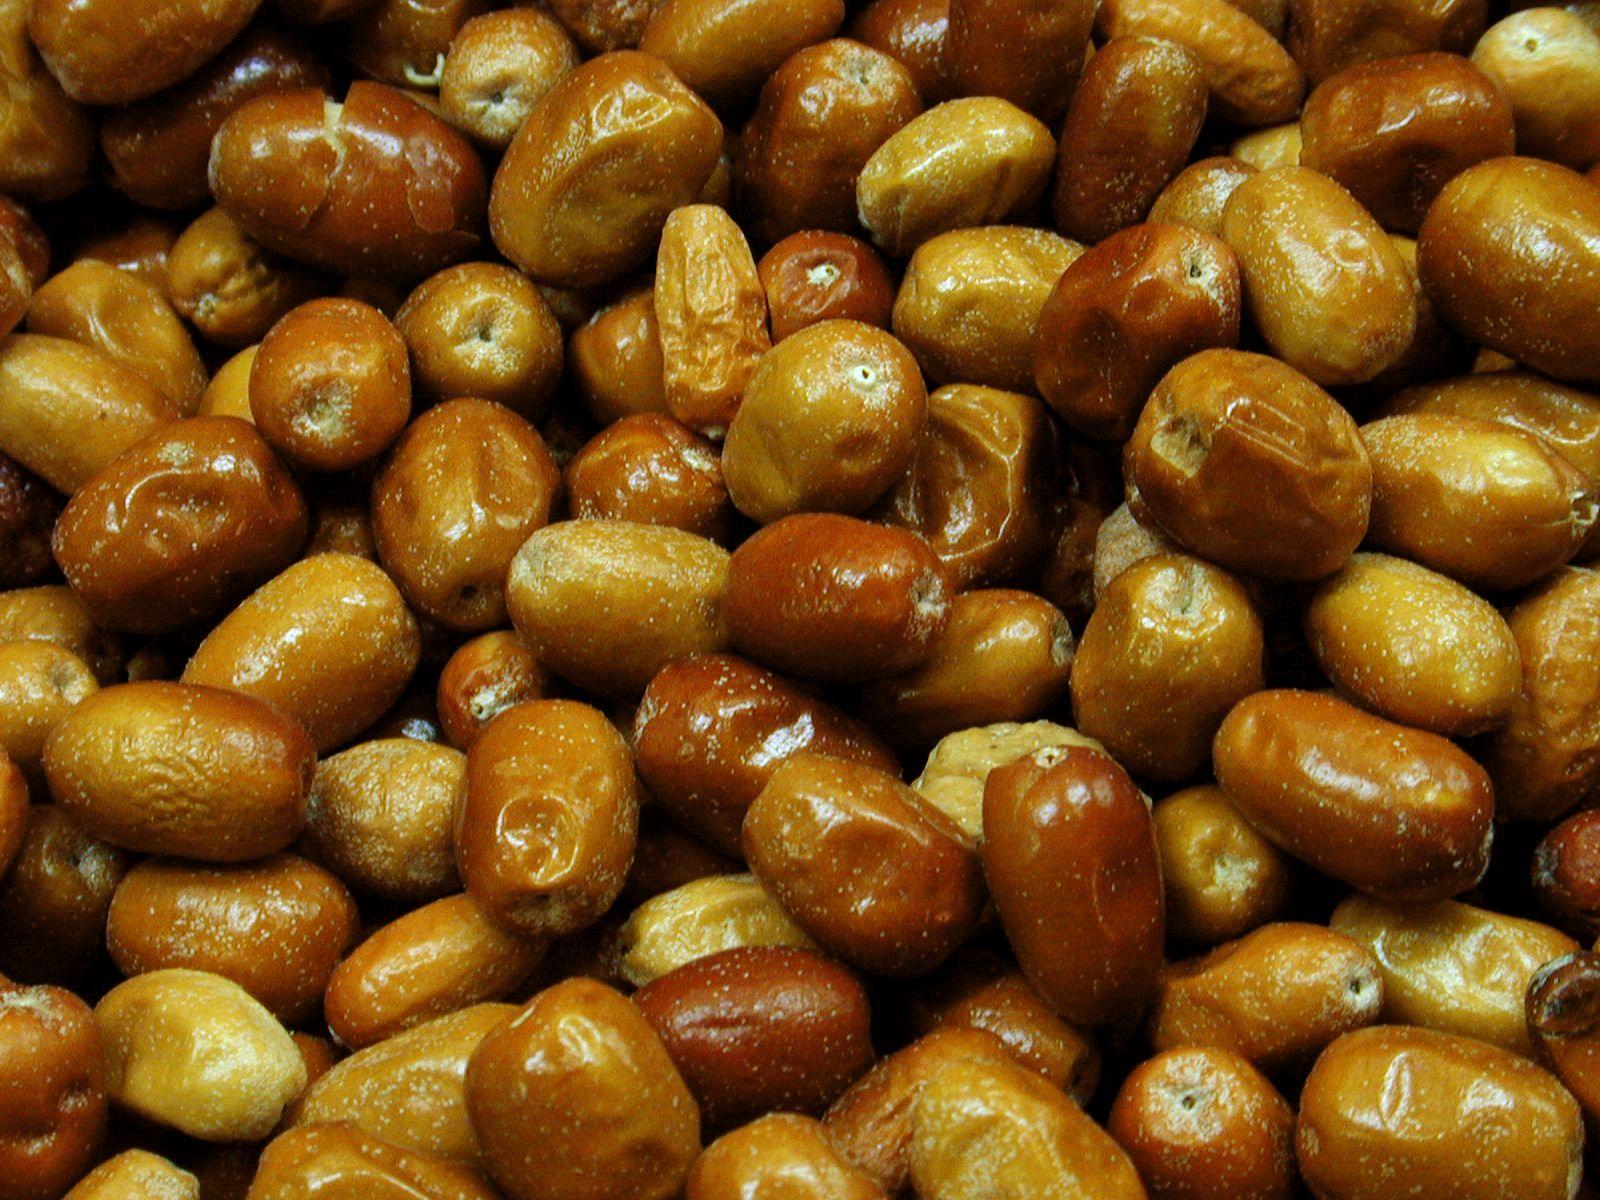 nuts fat salt oil salty oliy nut brown shiny glistening